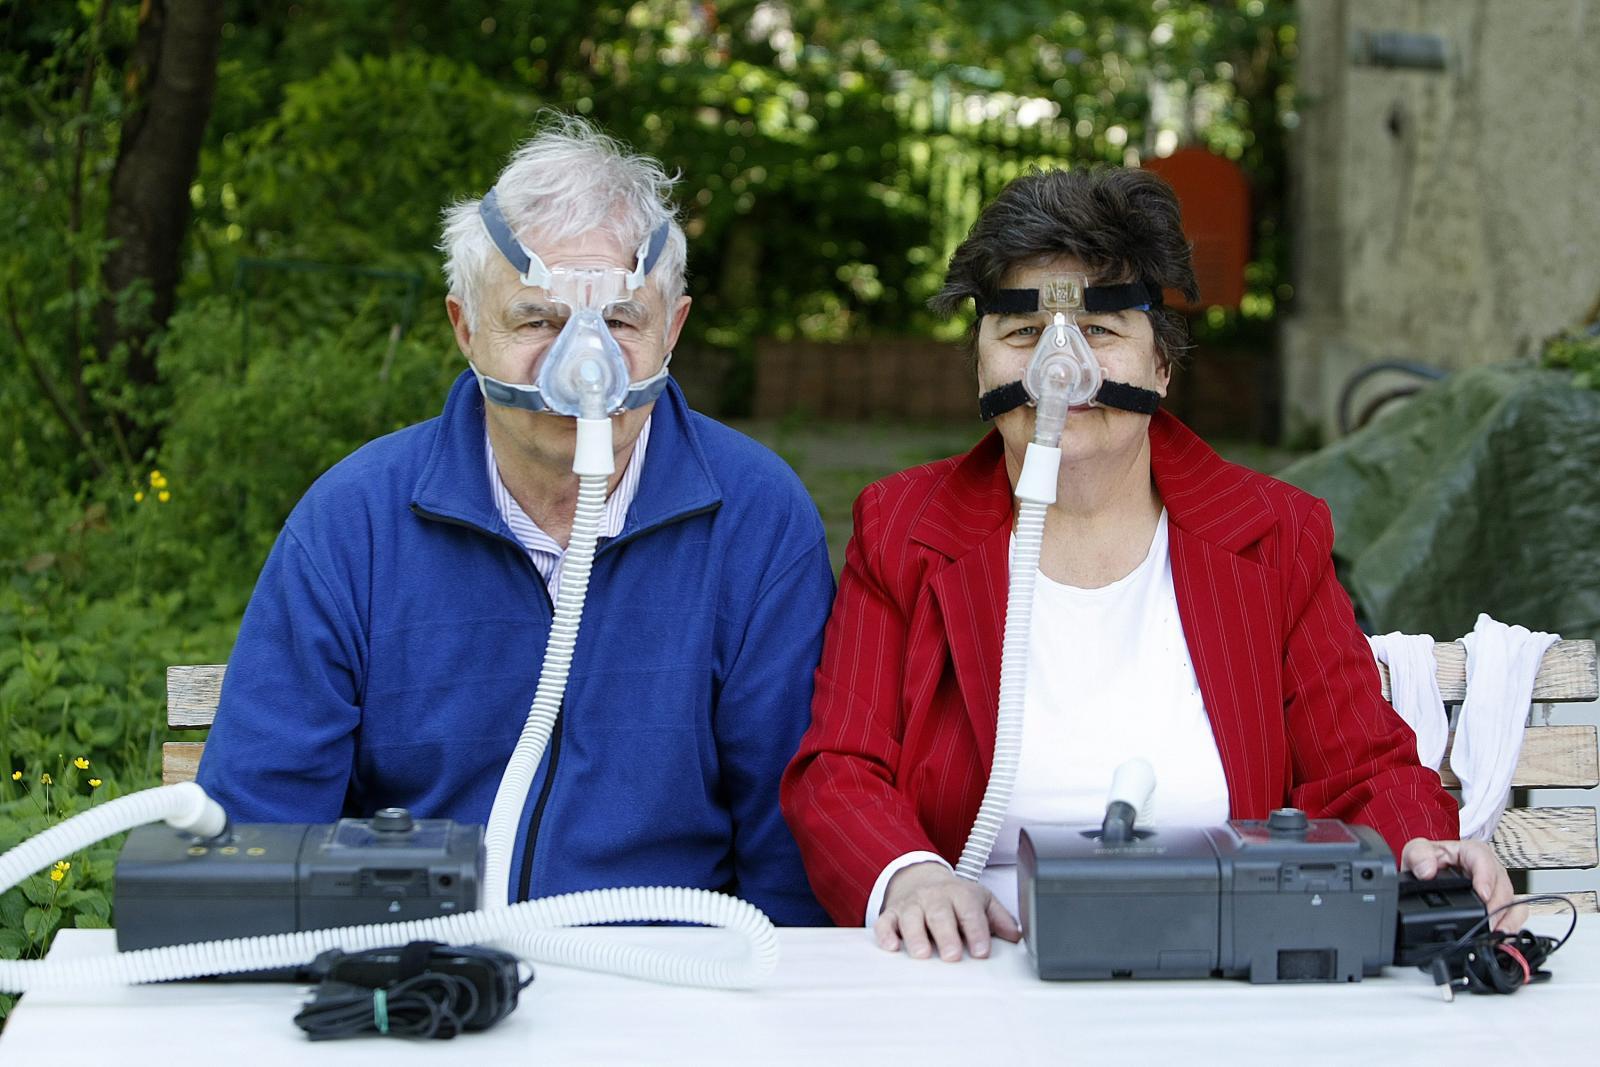 Bračni par Gordana i Veljko Lodeta boluju od teškog oblika apneje, pa oboje spavaju sa CPAP aparatom.